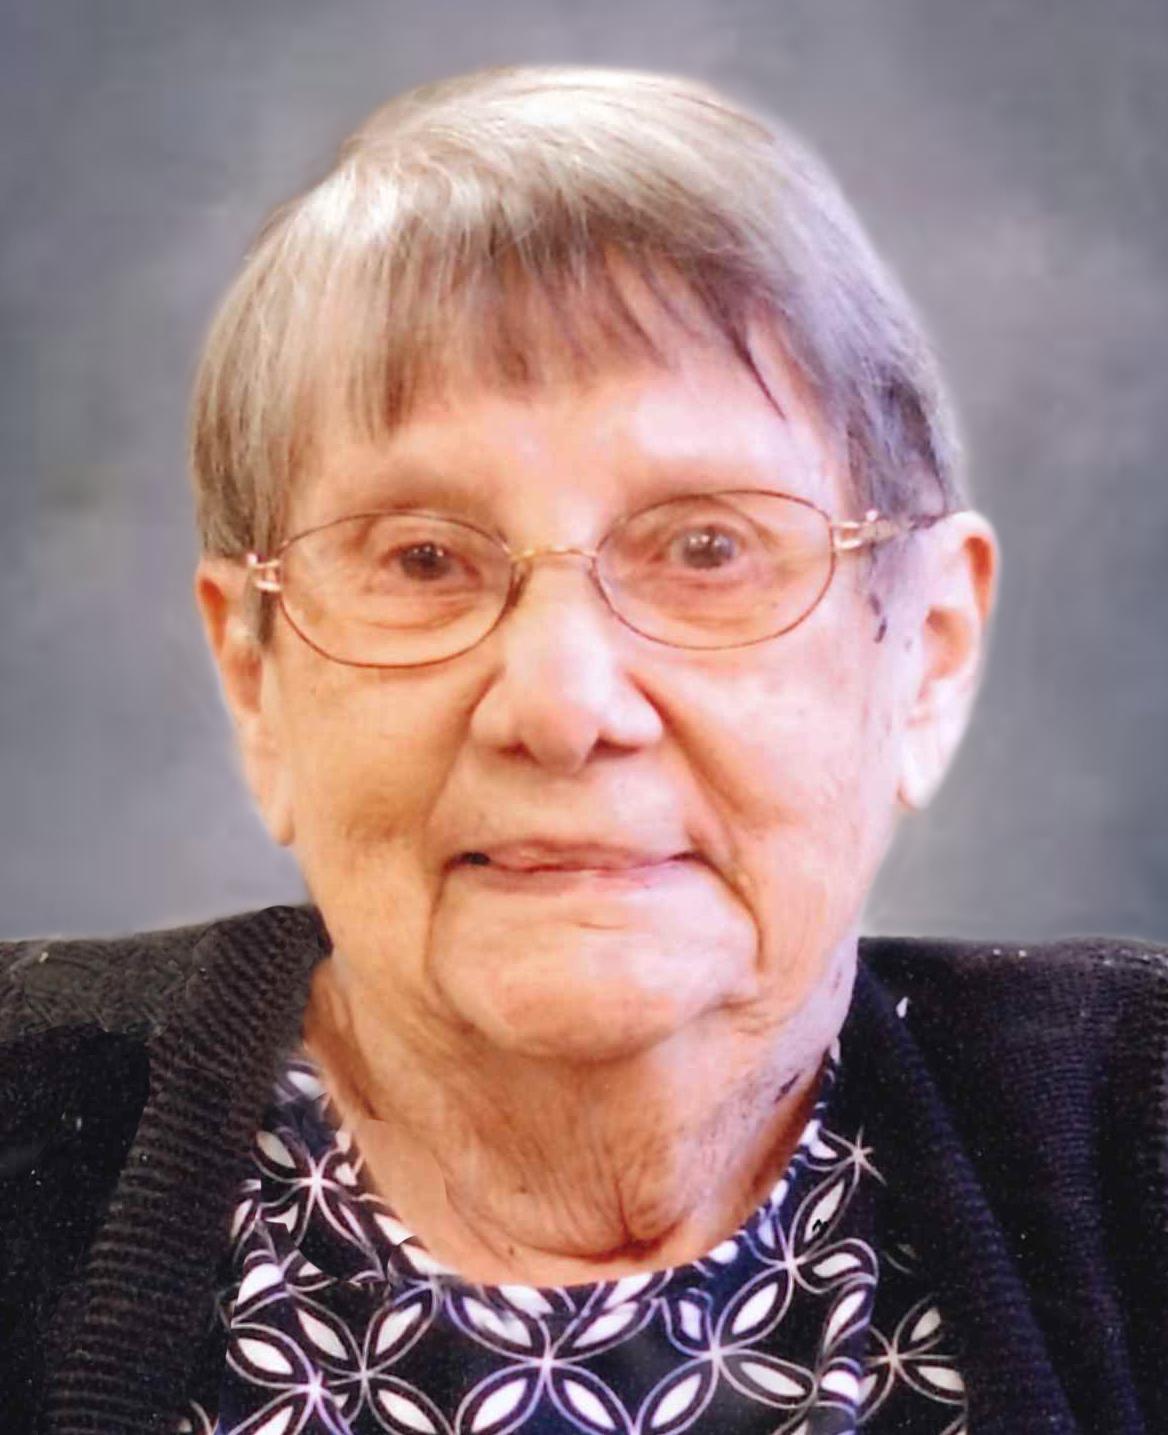 Arlene Mae (Hanni) Clawson, 95 years of age, of Holdrege